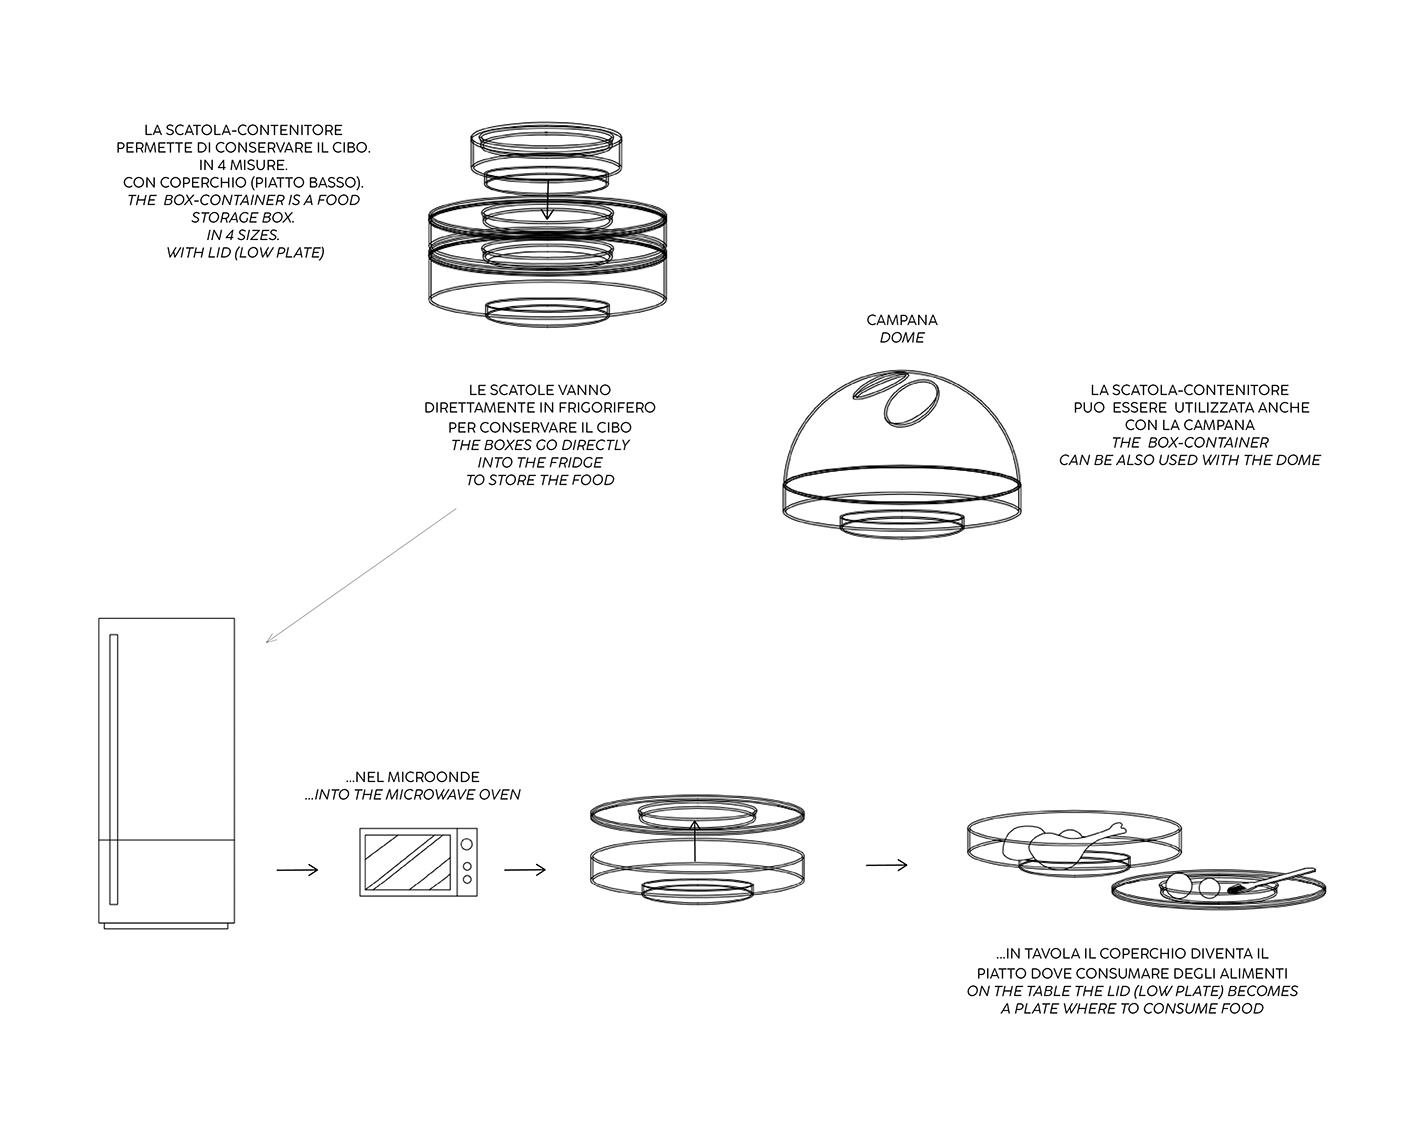 Overbox-disegno